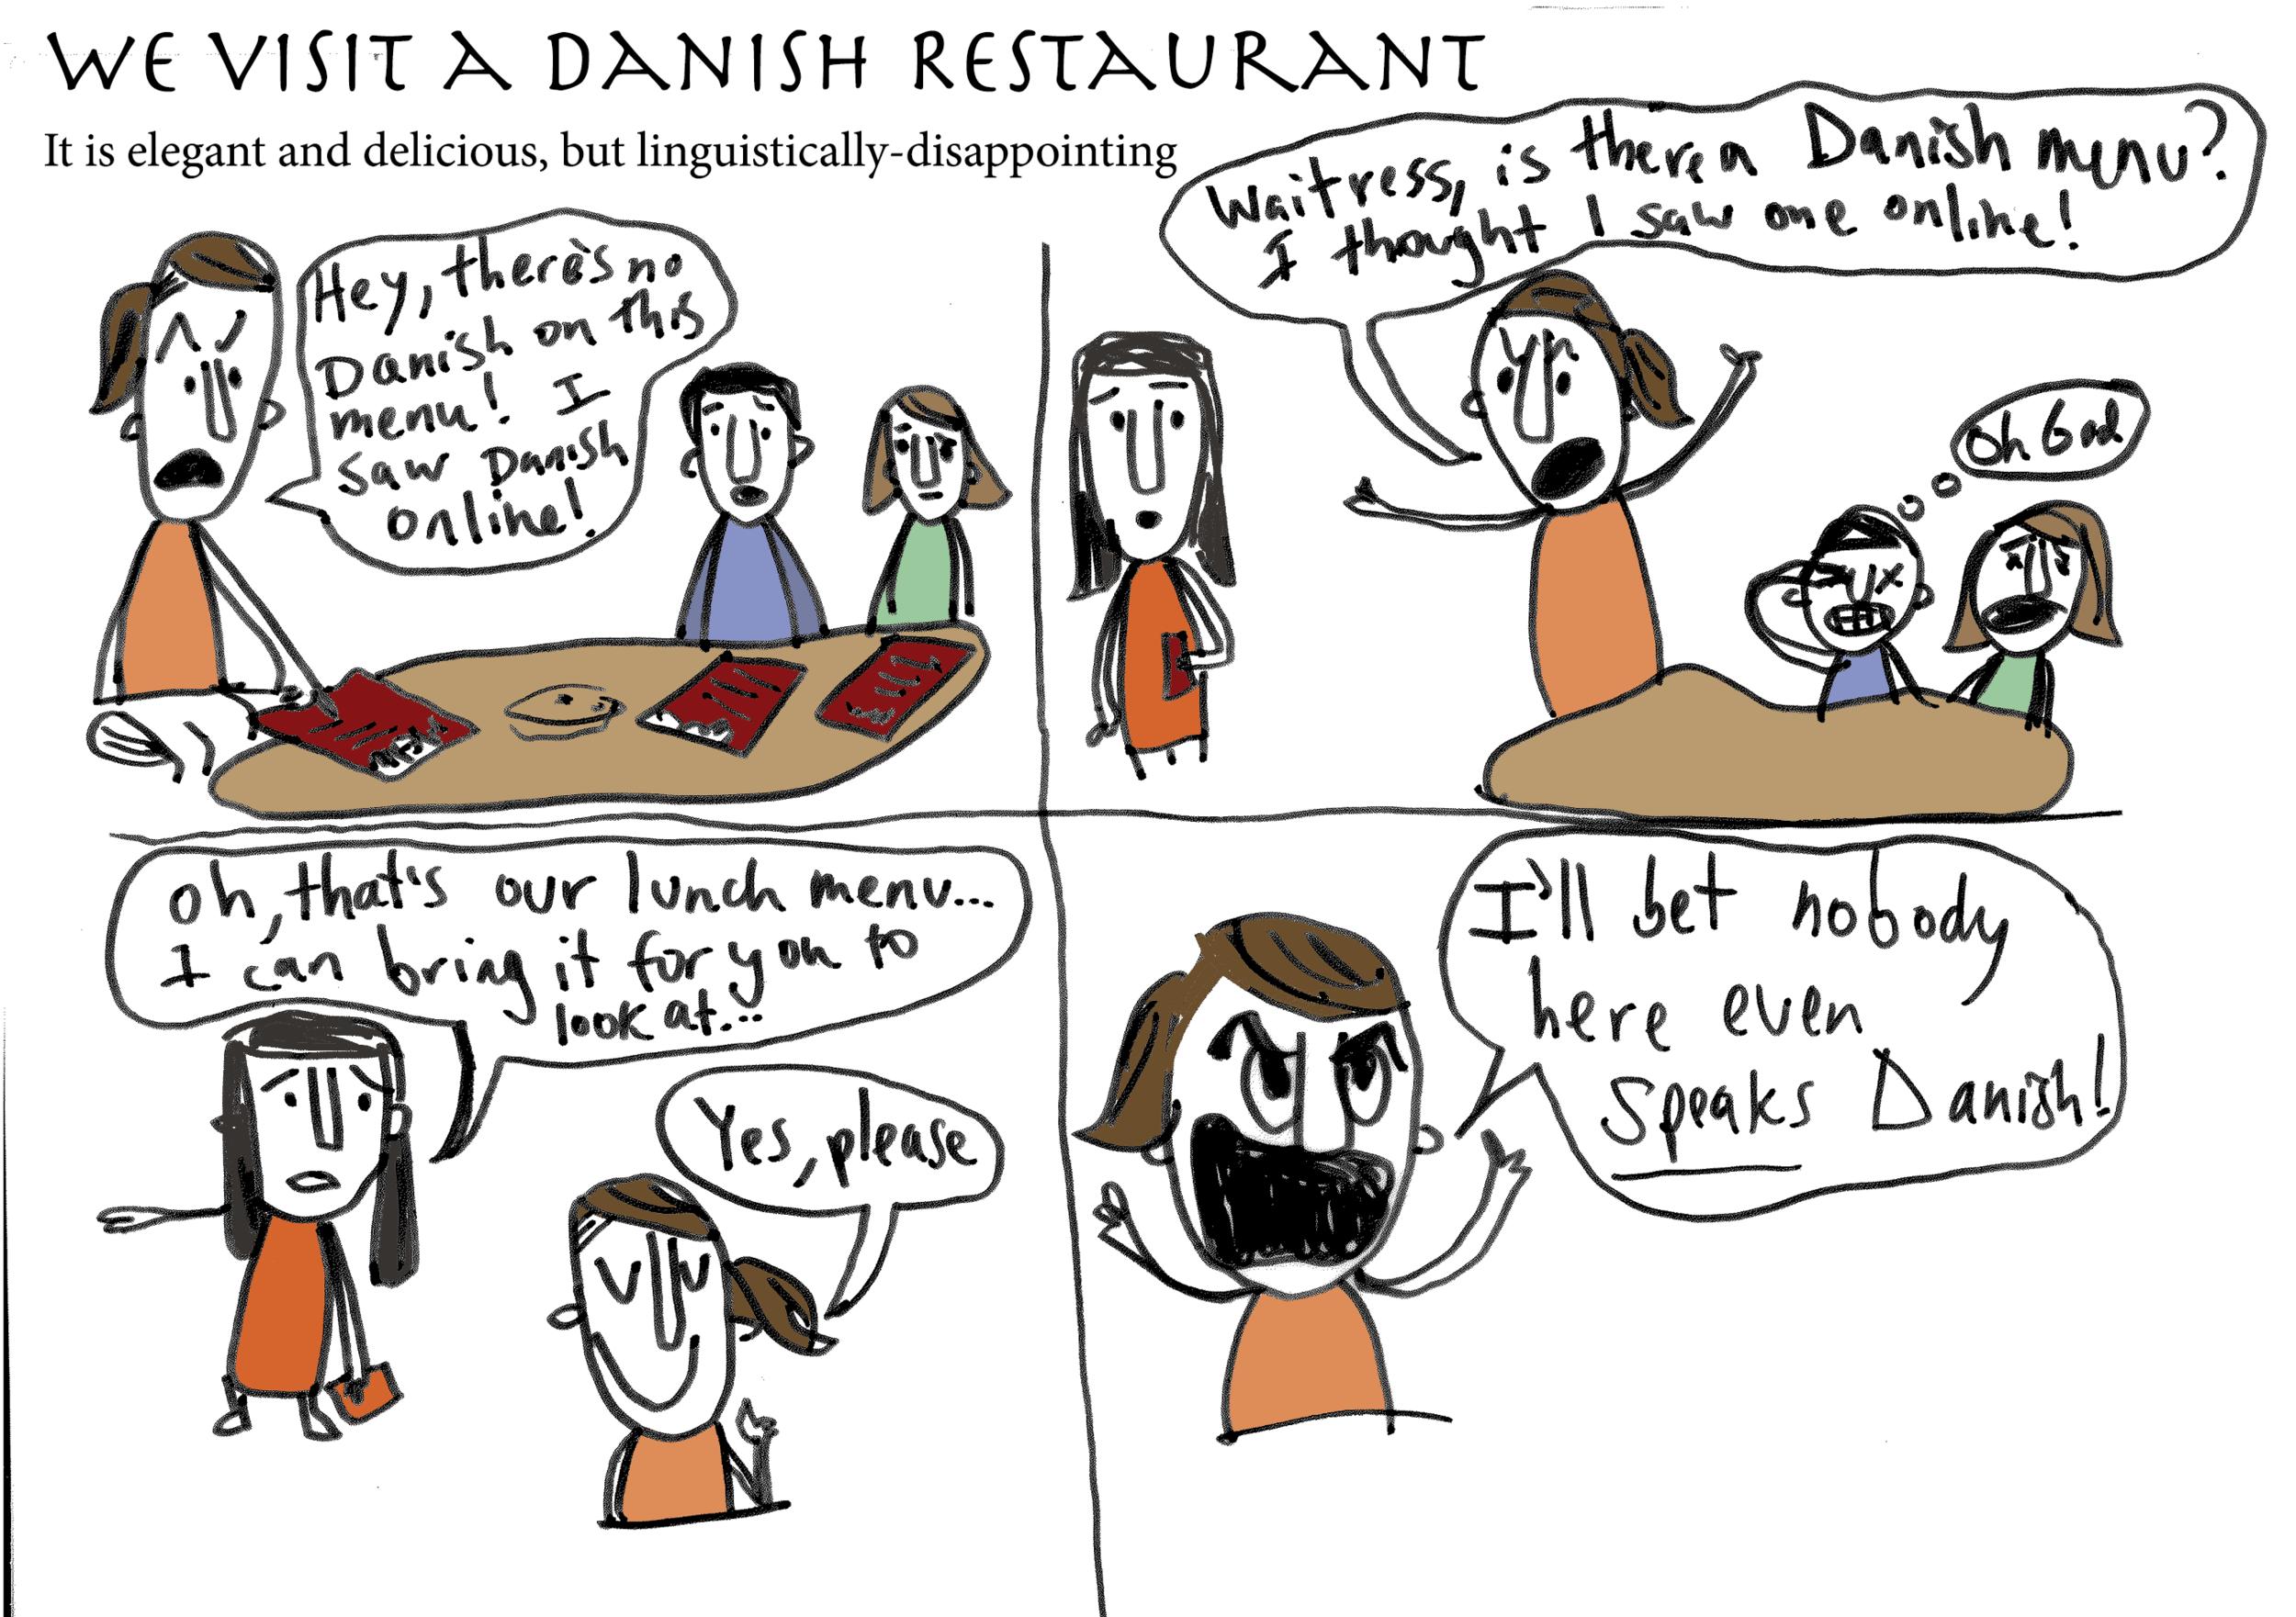 Danish Restaurant in AK